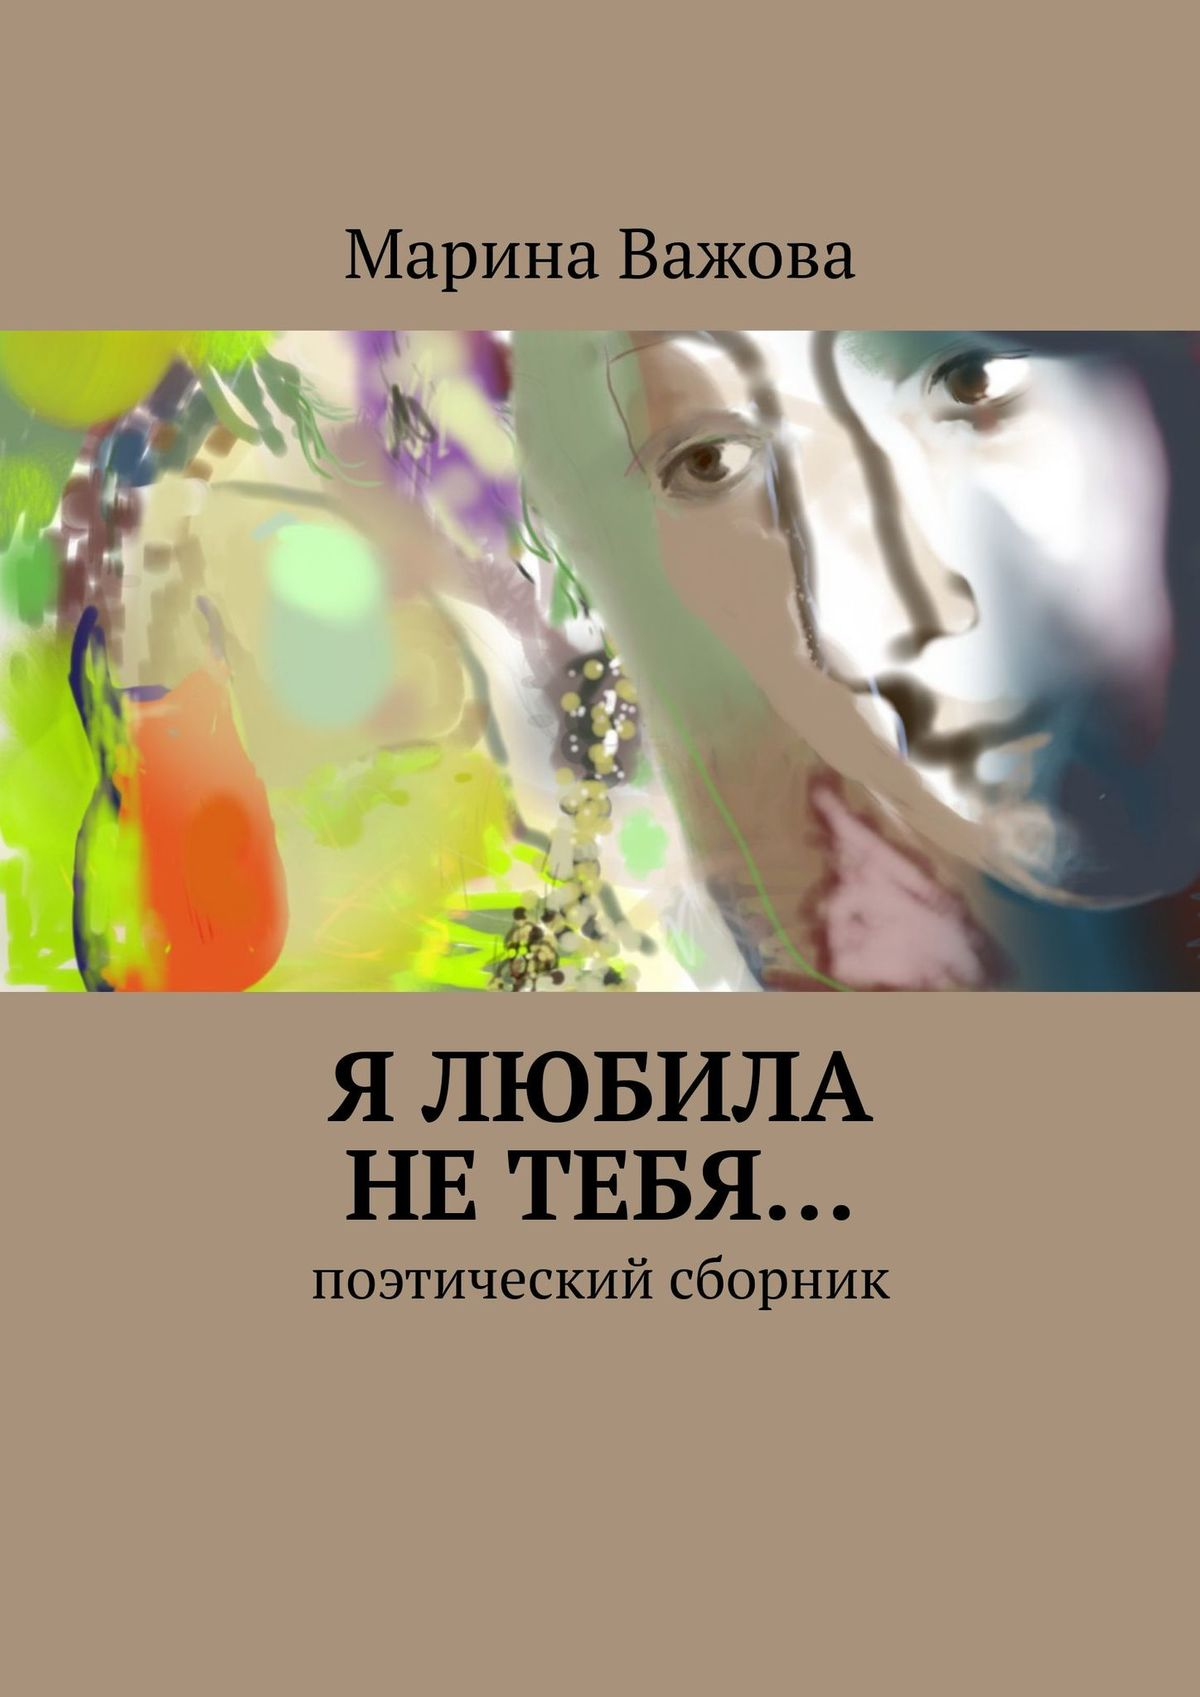 Марина Важова Я любила не тебя… Сборник стихов марина важова вещие сны сборник рассказов